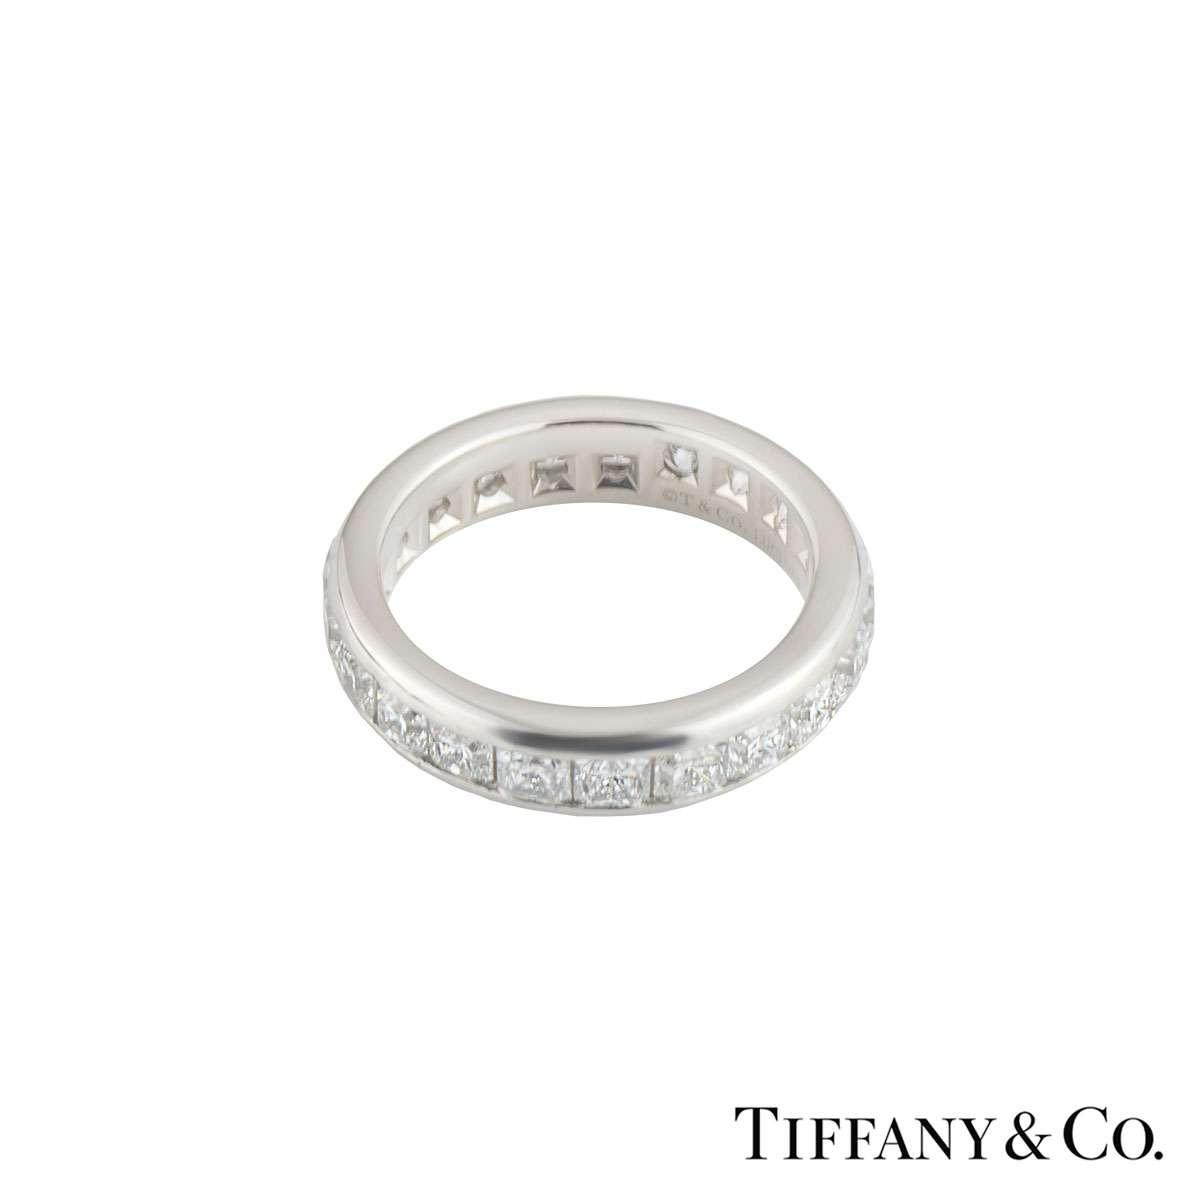 Tiffany & Co Diamond Lucida Eternity Ring 2.73ct